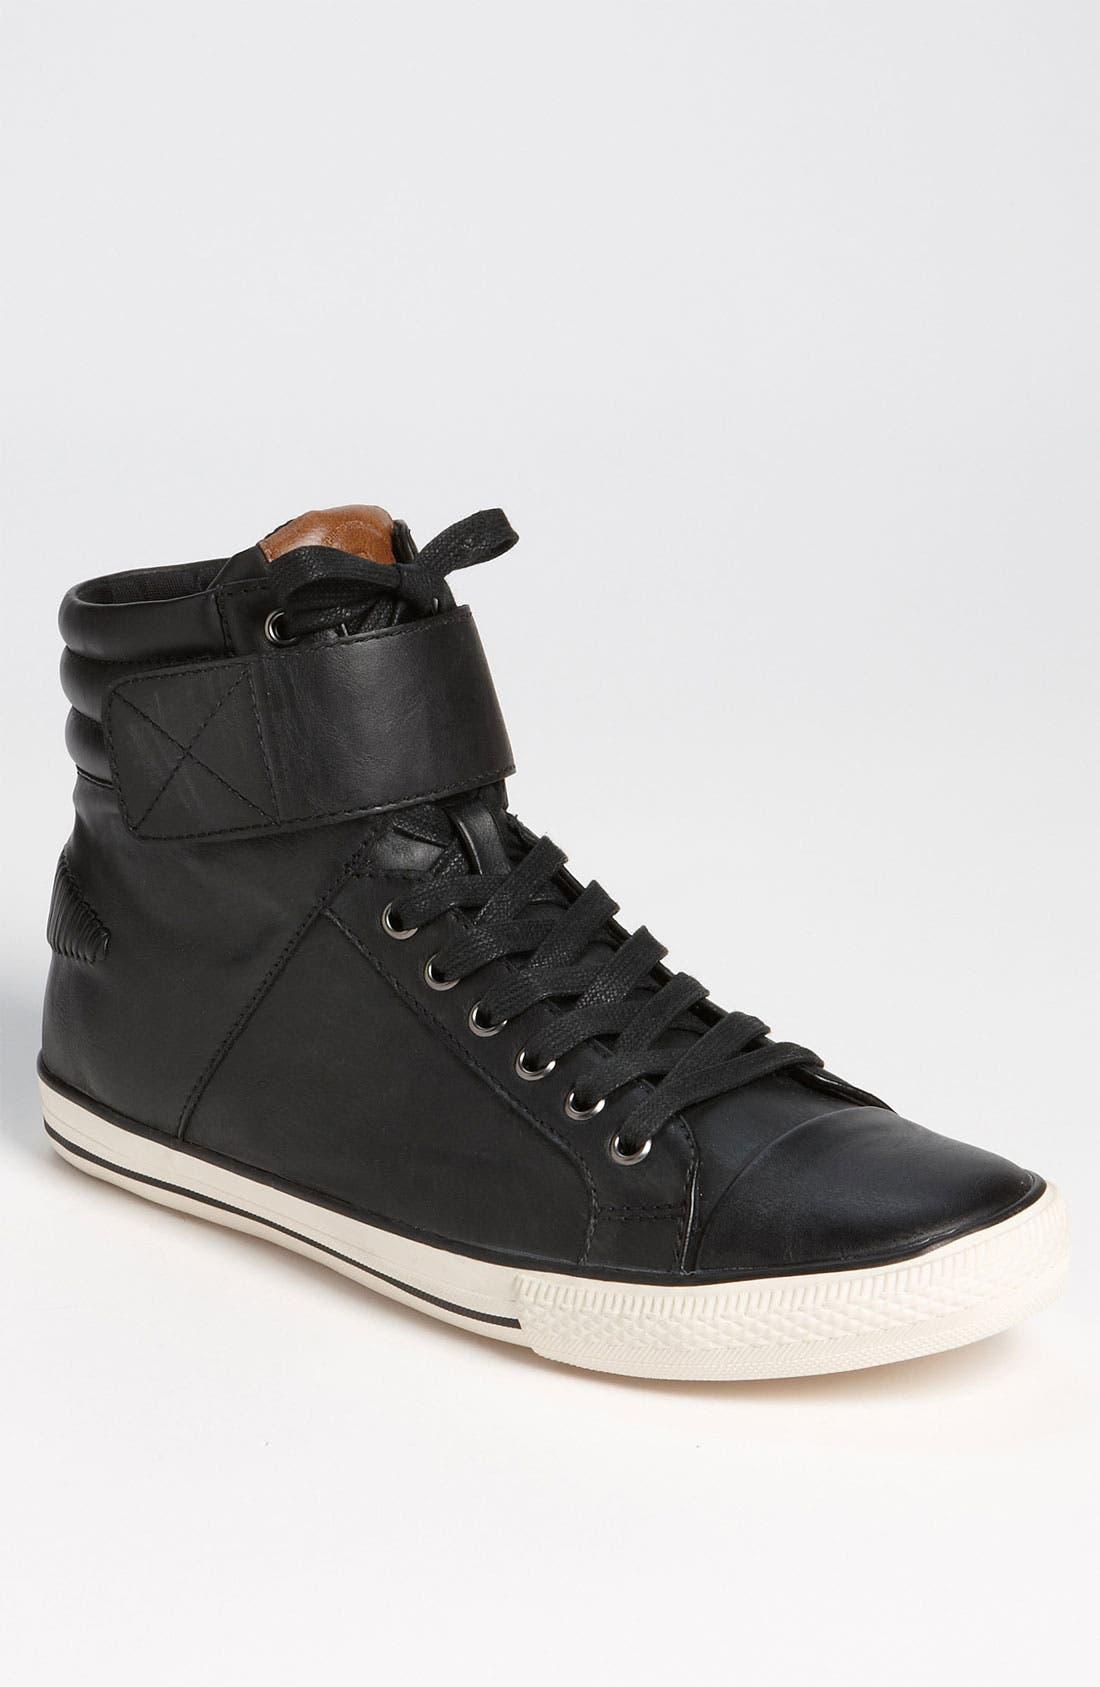 Alternate Image 1 Selected - ALDO 'Heit' High Top Sneaker